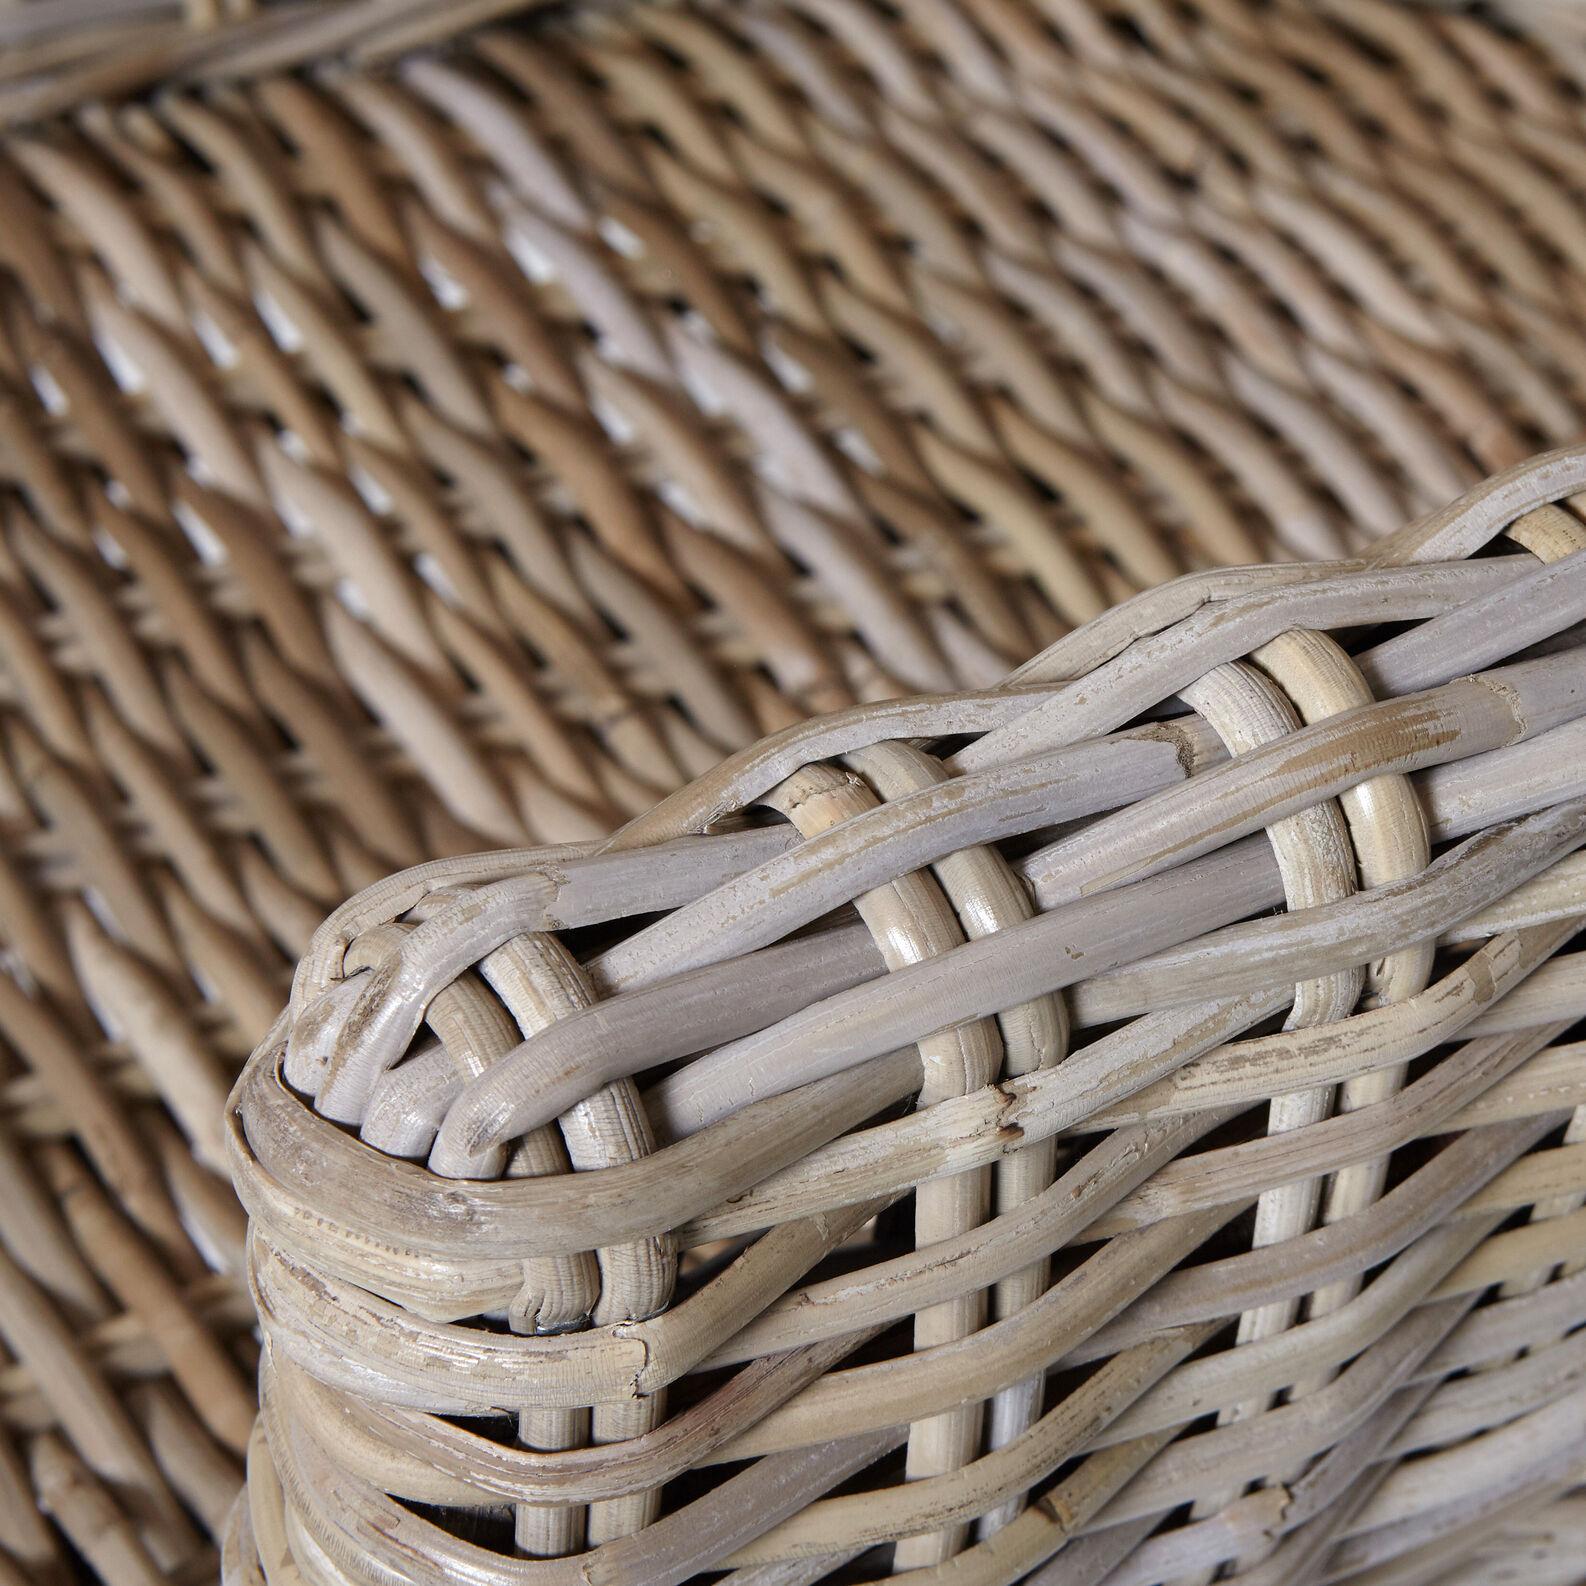 Bungalow armchair in hand-woven rattan